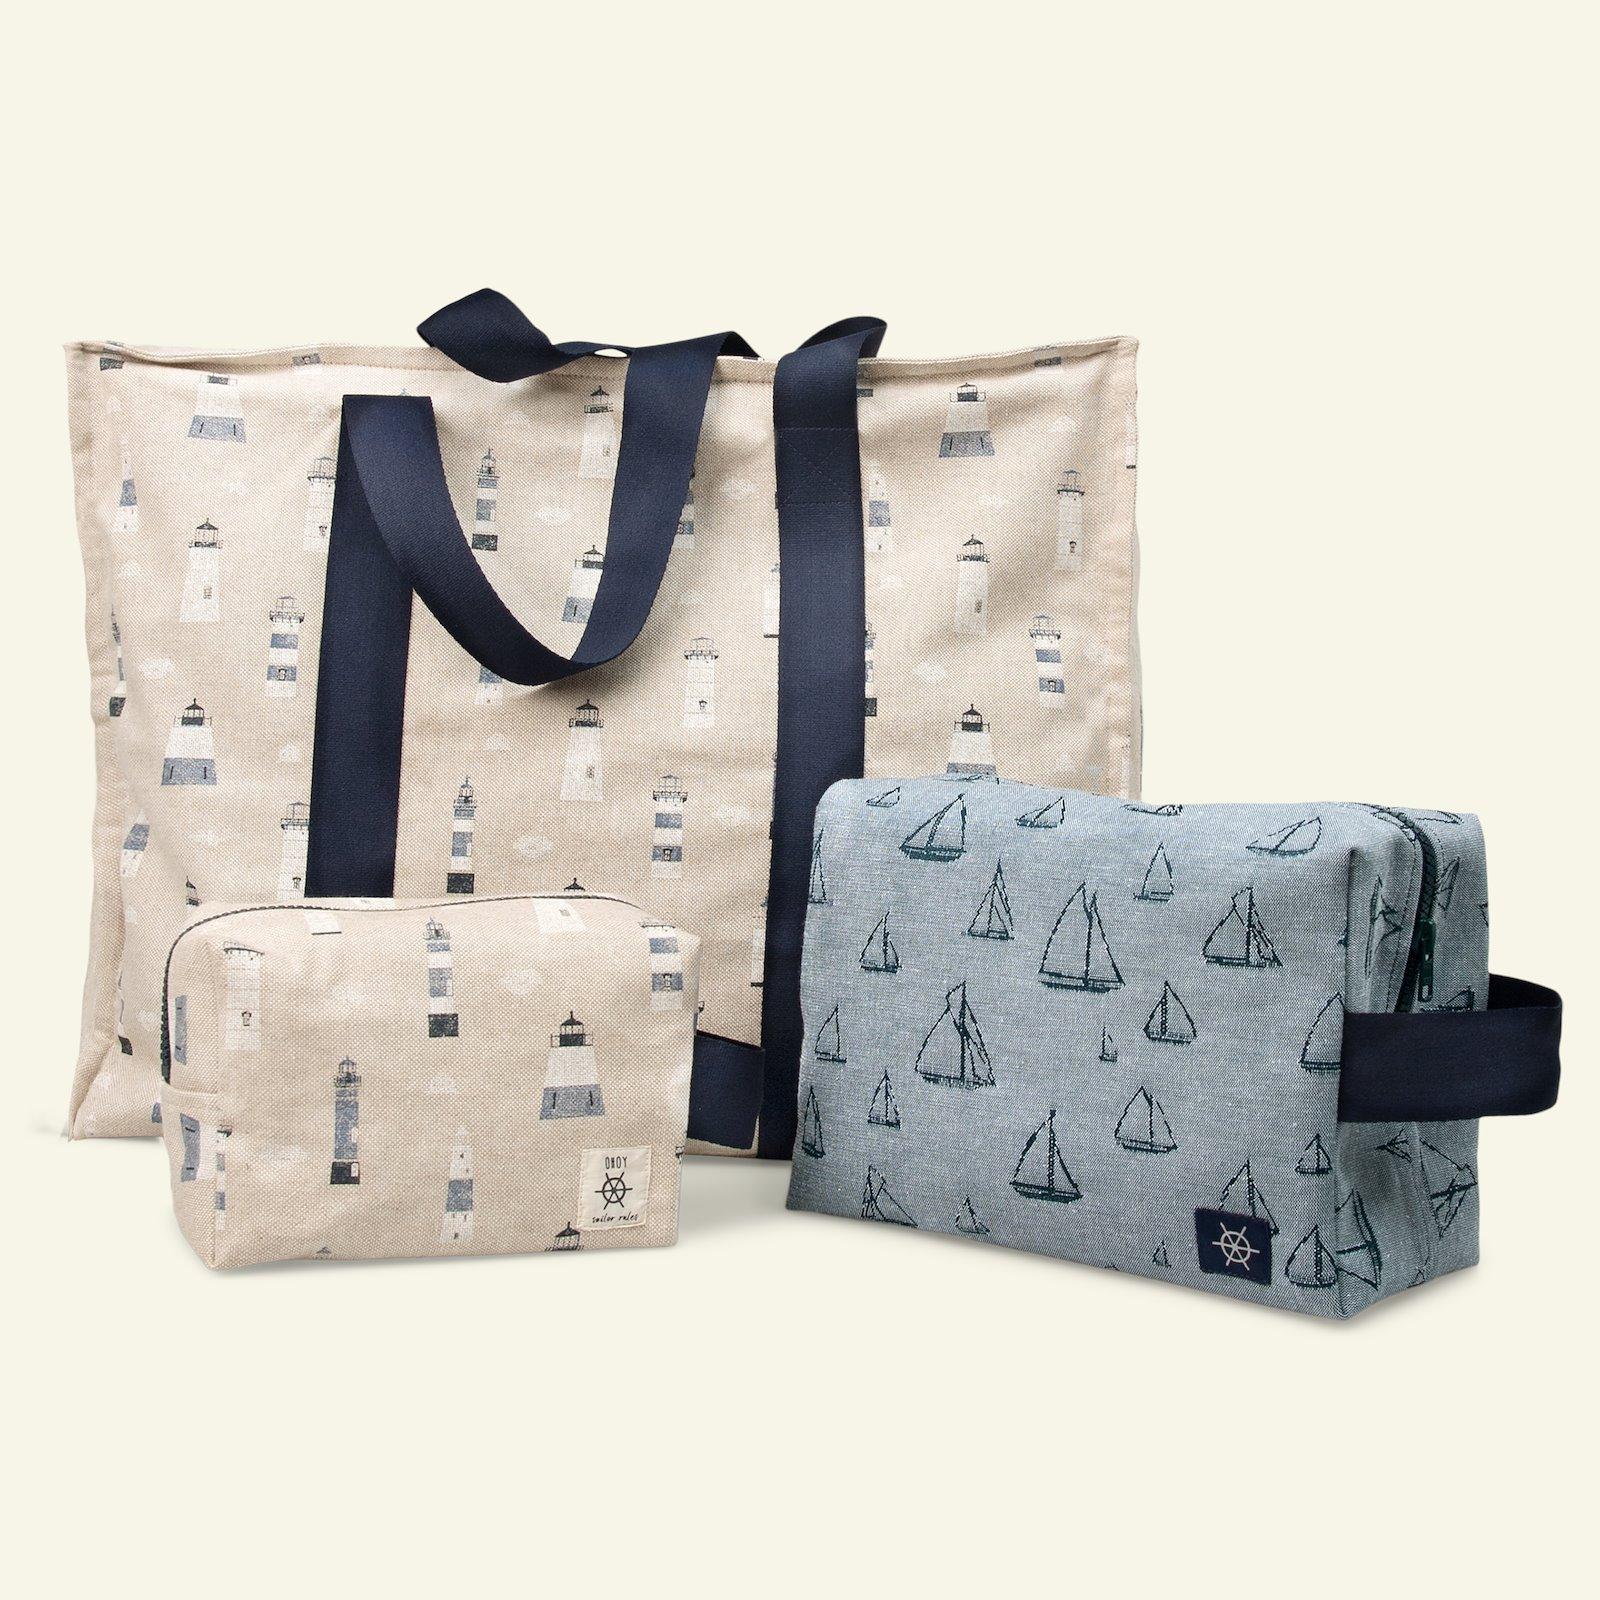 Picnic bag p90337_760278_20955_p90300_760278_824062_26544_26547_bundle